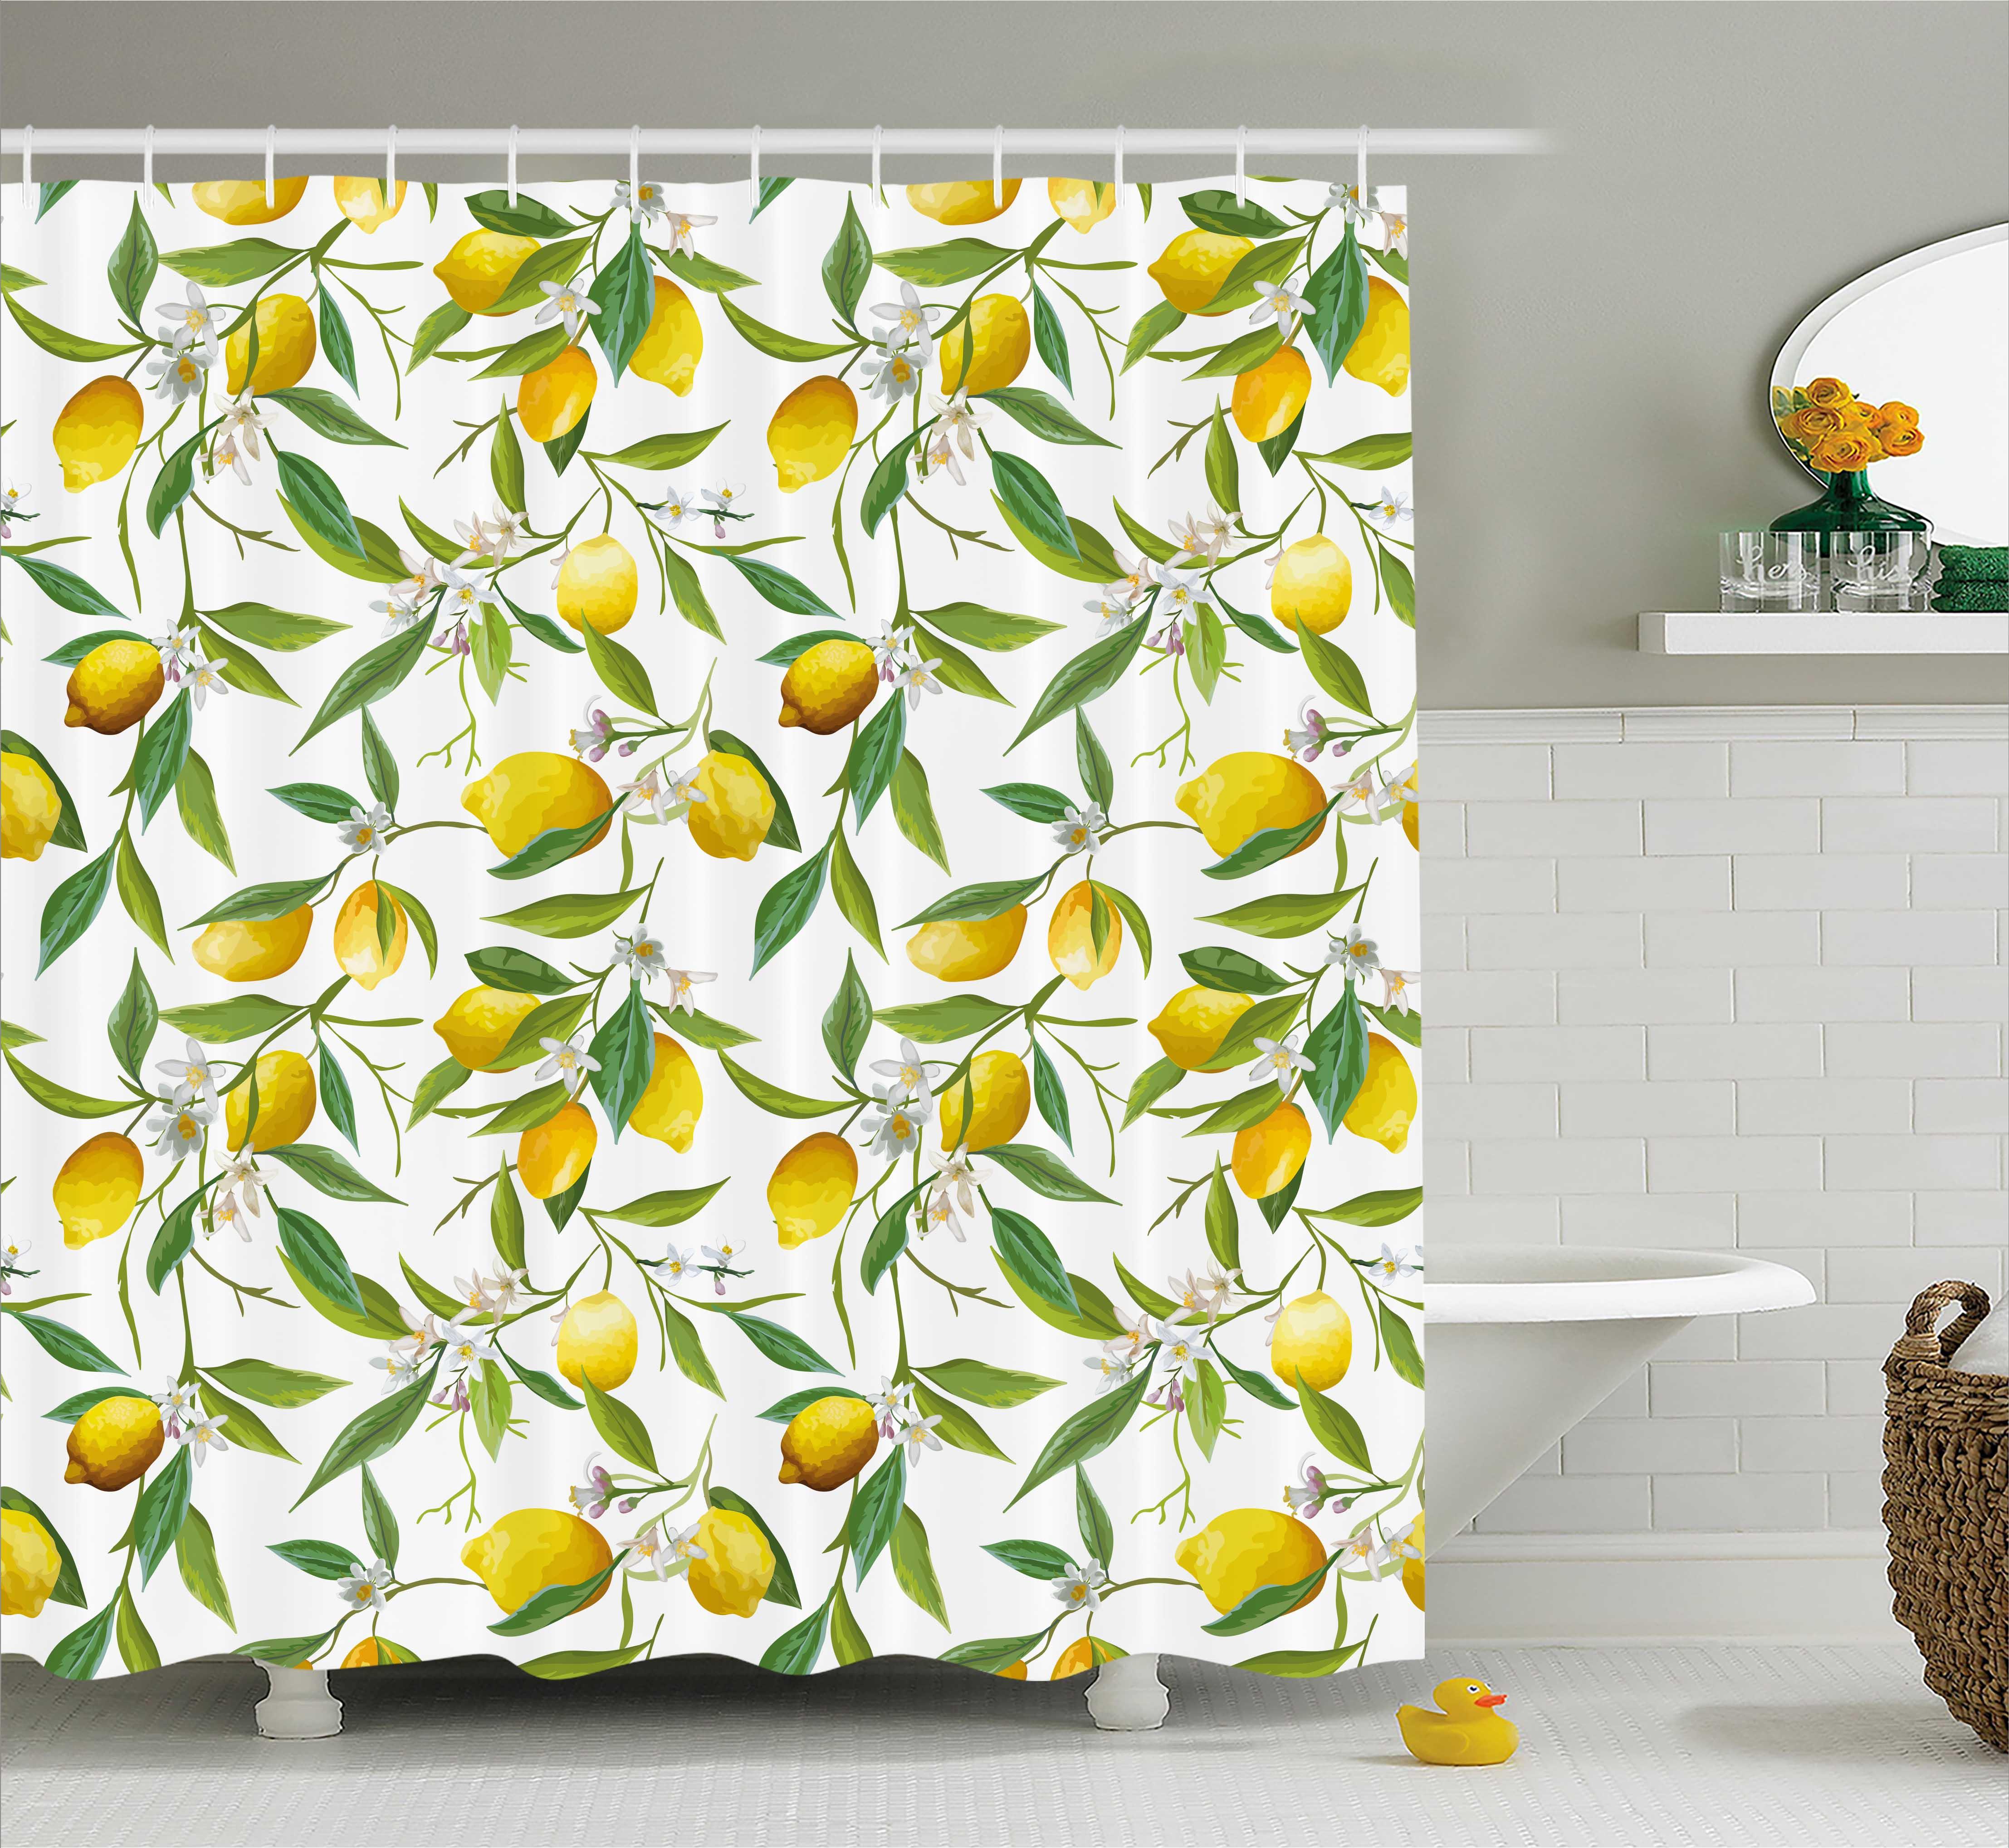 Nature Shower Curtain Flowering Lemon Woody Plant Romance Habitat Citrus Fresh Background Fabric Bathroom Set With Hooks Fern Green Yellow White